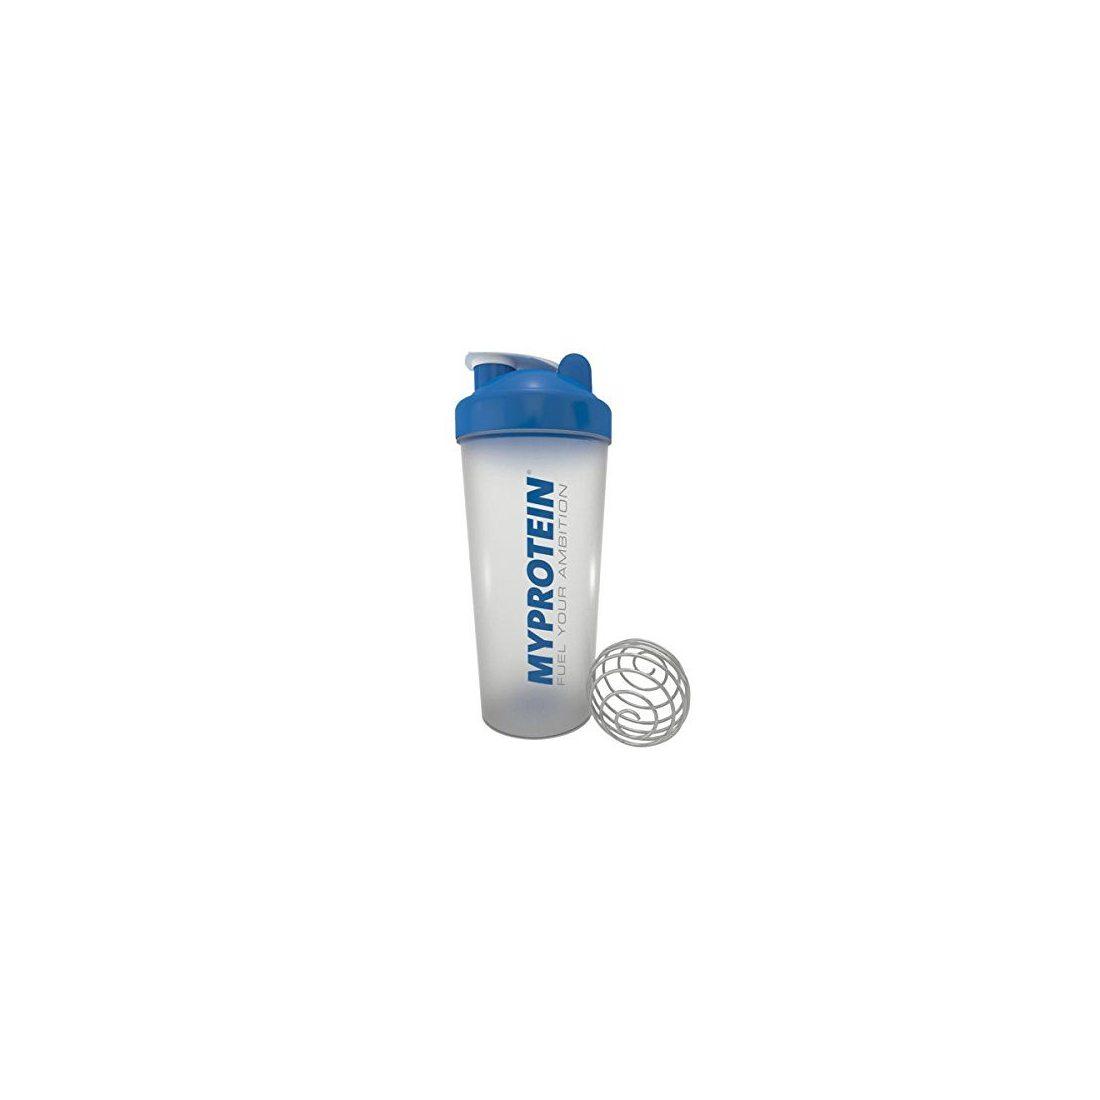 My Protein Bouteille de Shaker